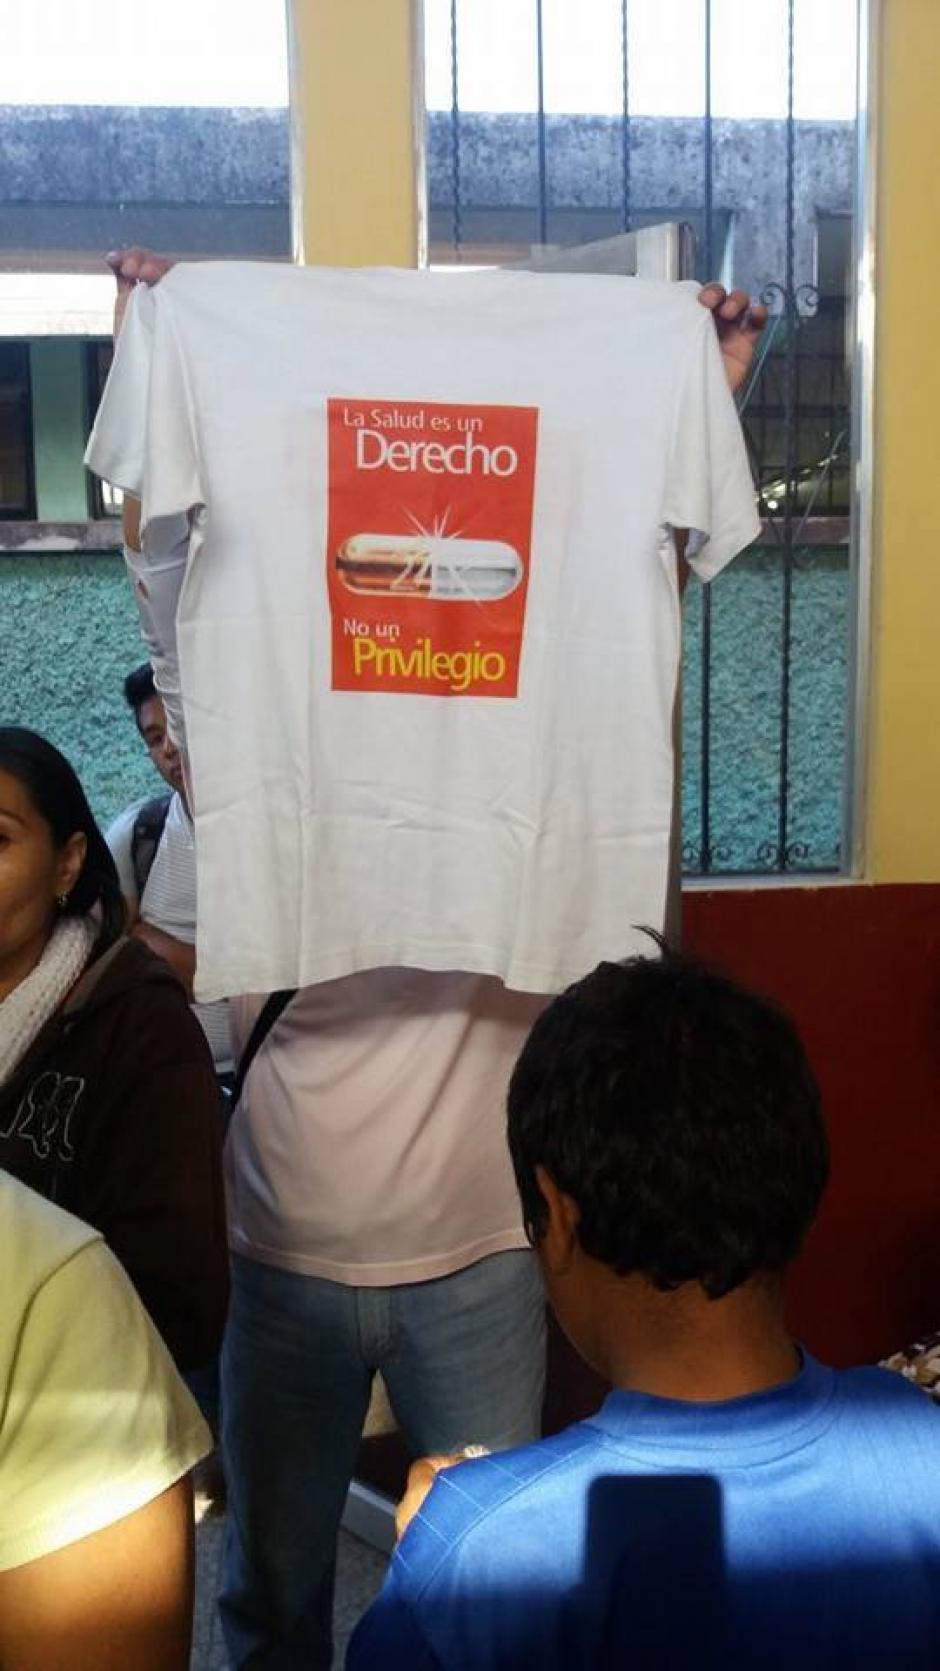 Cierre de consulta externa del Hospital Nacional de Amatitlán provoca molestia en pacientes que no reciben atención médica. (Foto:Pampichi News Amatitlán)